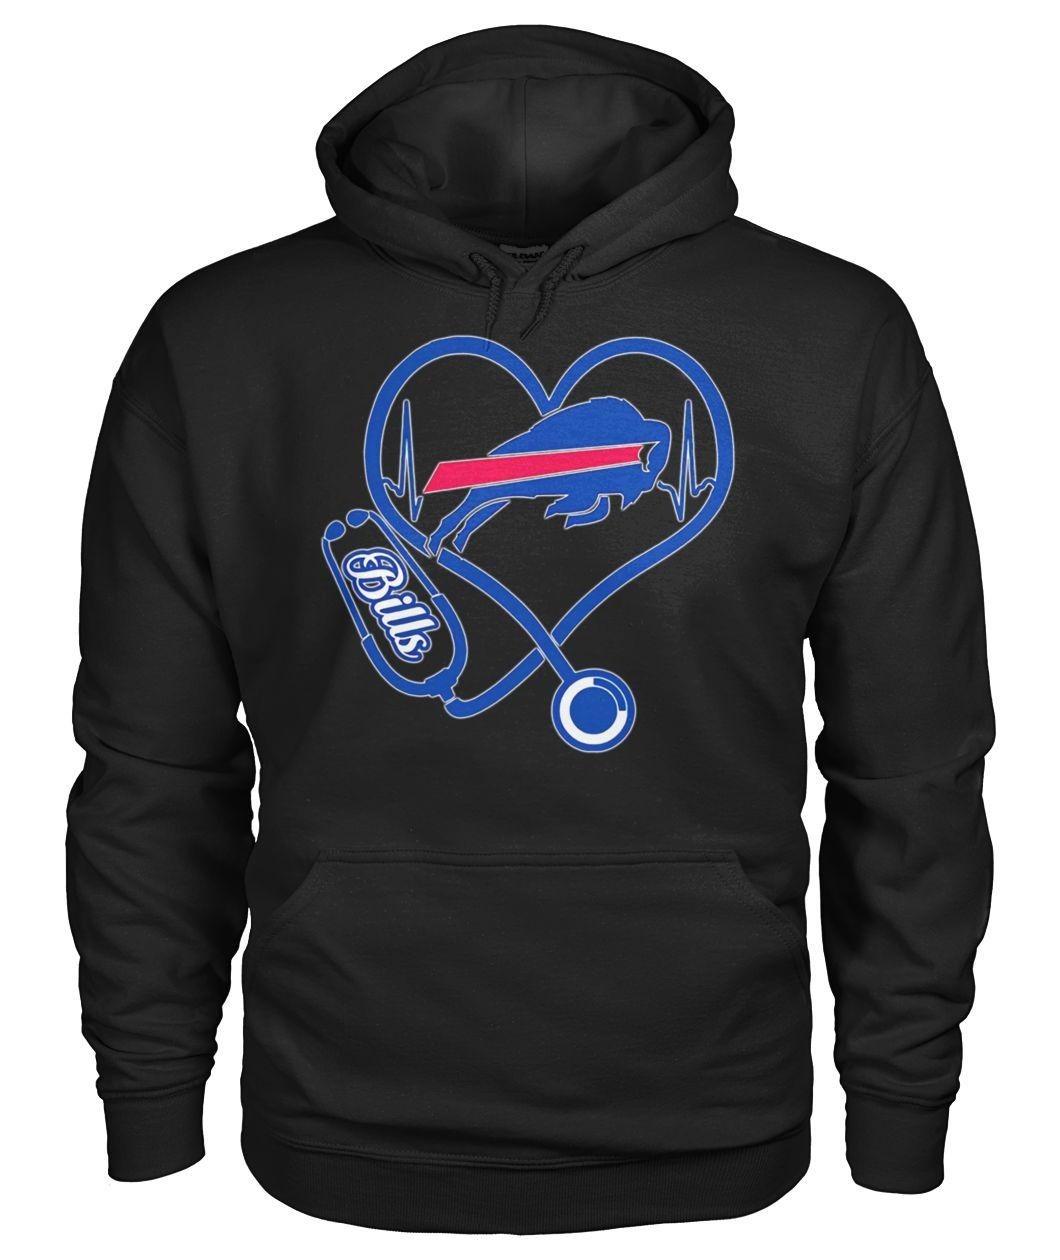 Nurse Heartbeat Buffalo Bills Shirt Sweater Hoodie And